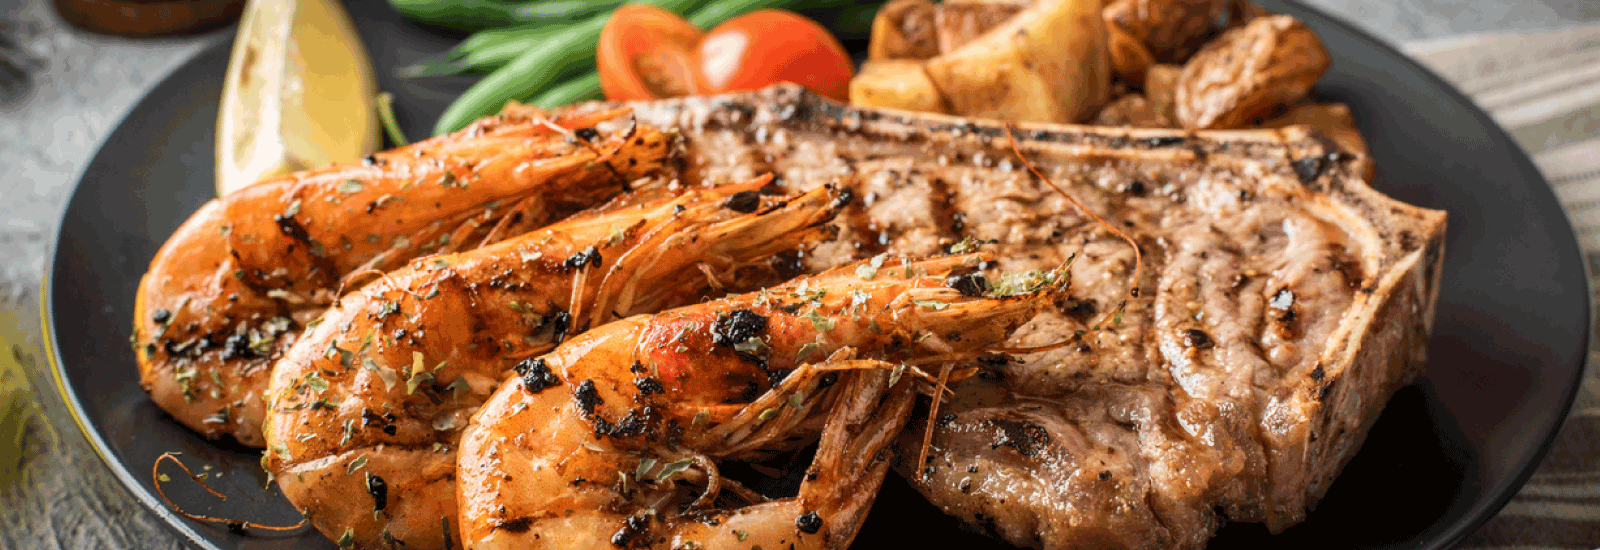 Steak and Seafood Near Eielson AFB